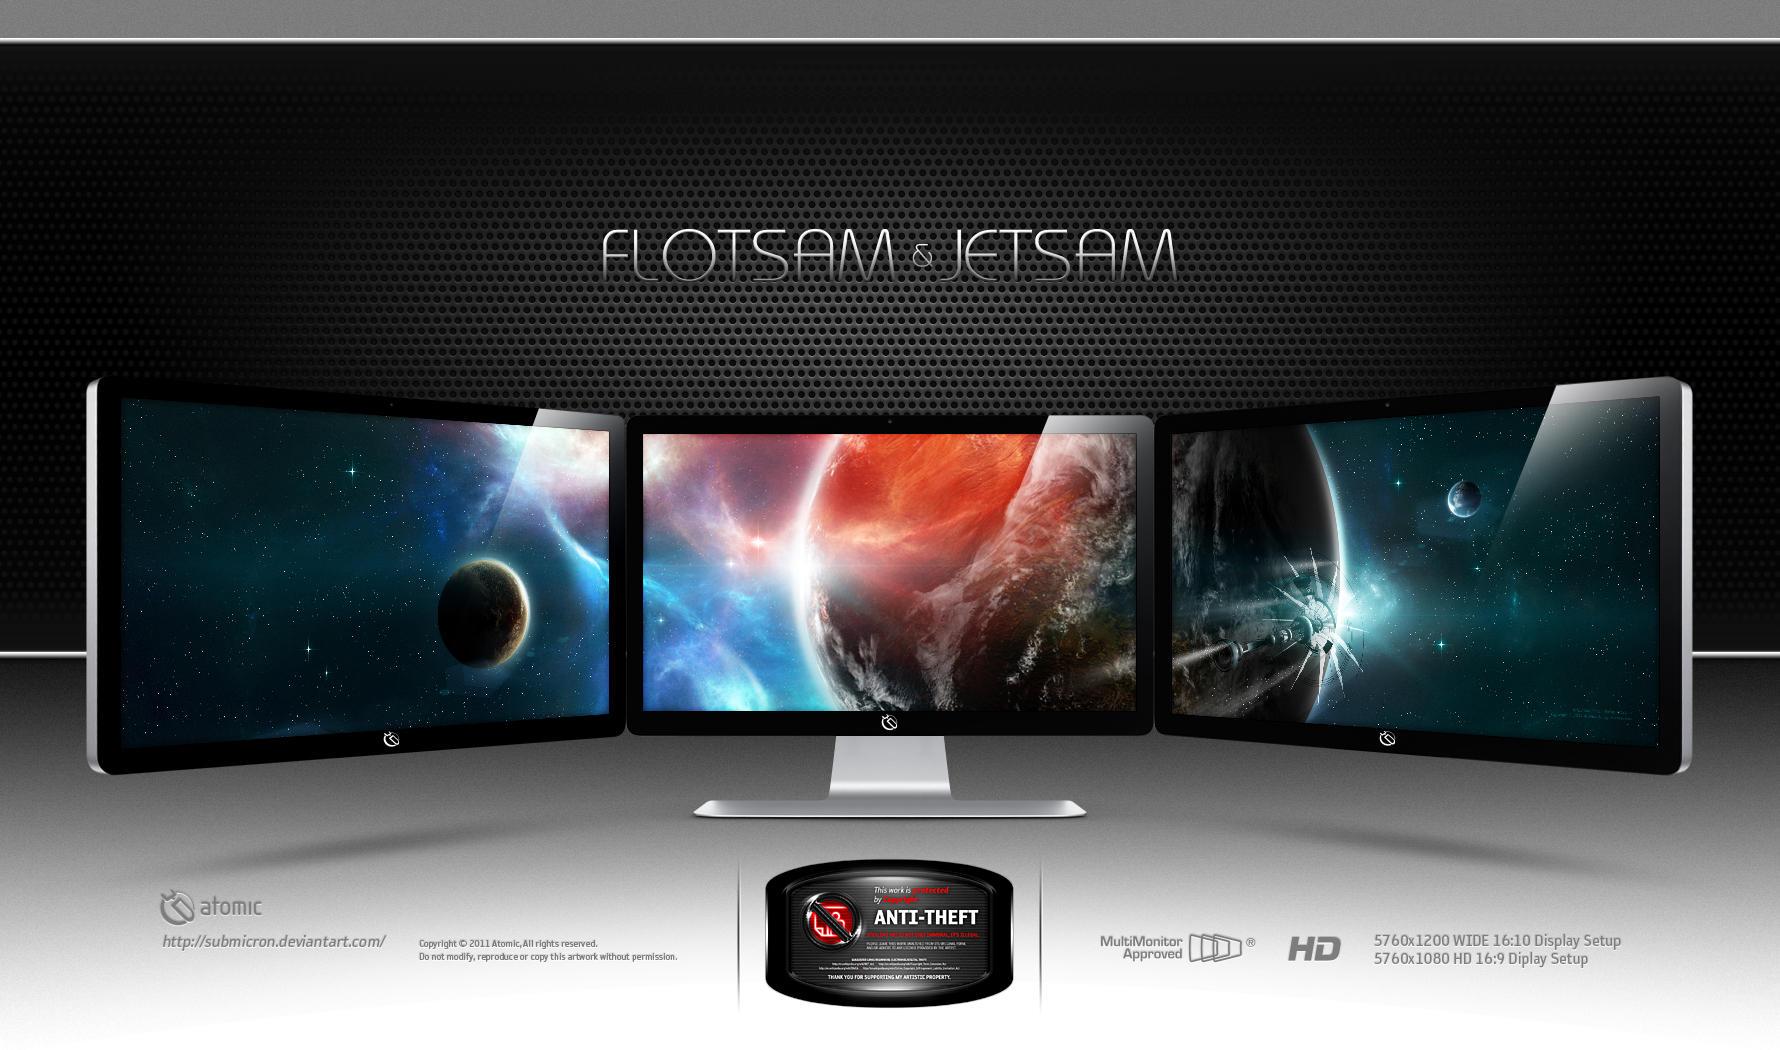 Flotsam and Jetsam by submicron